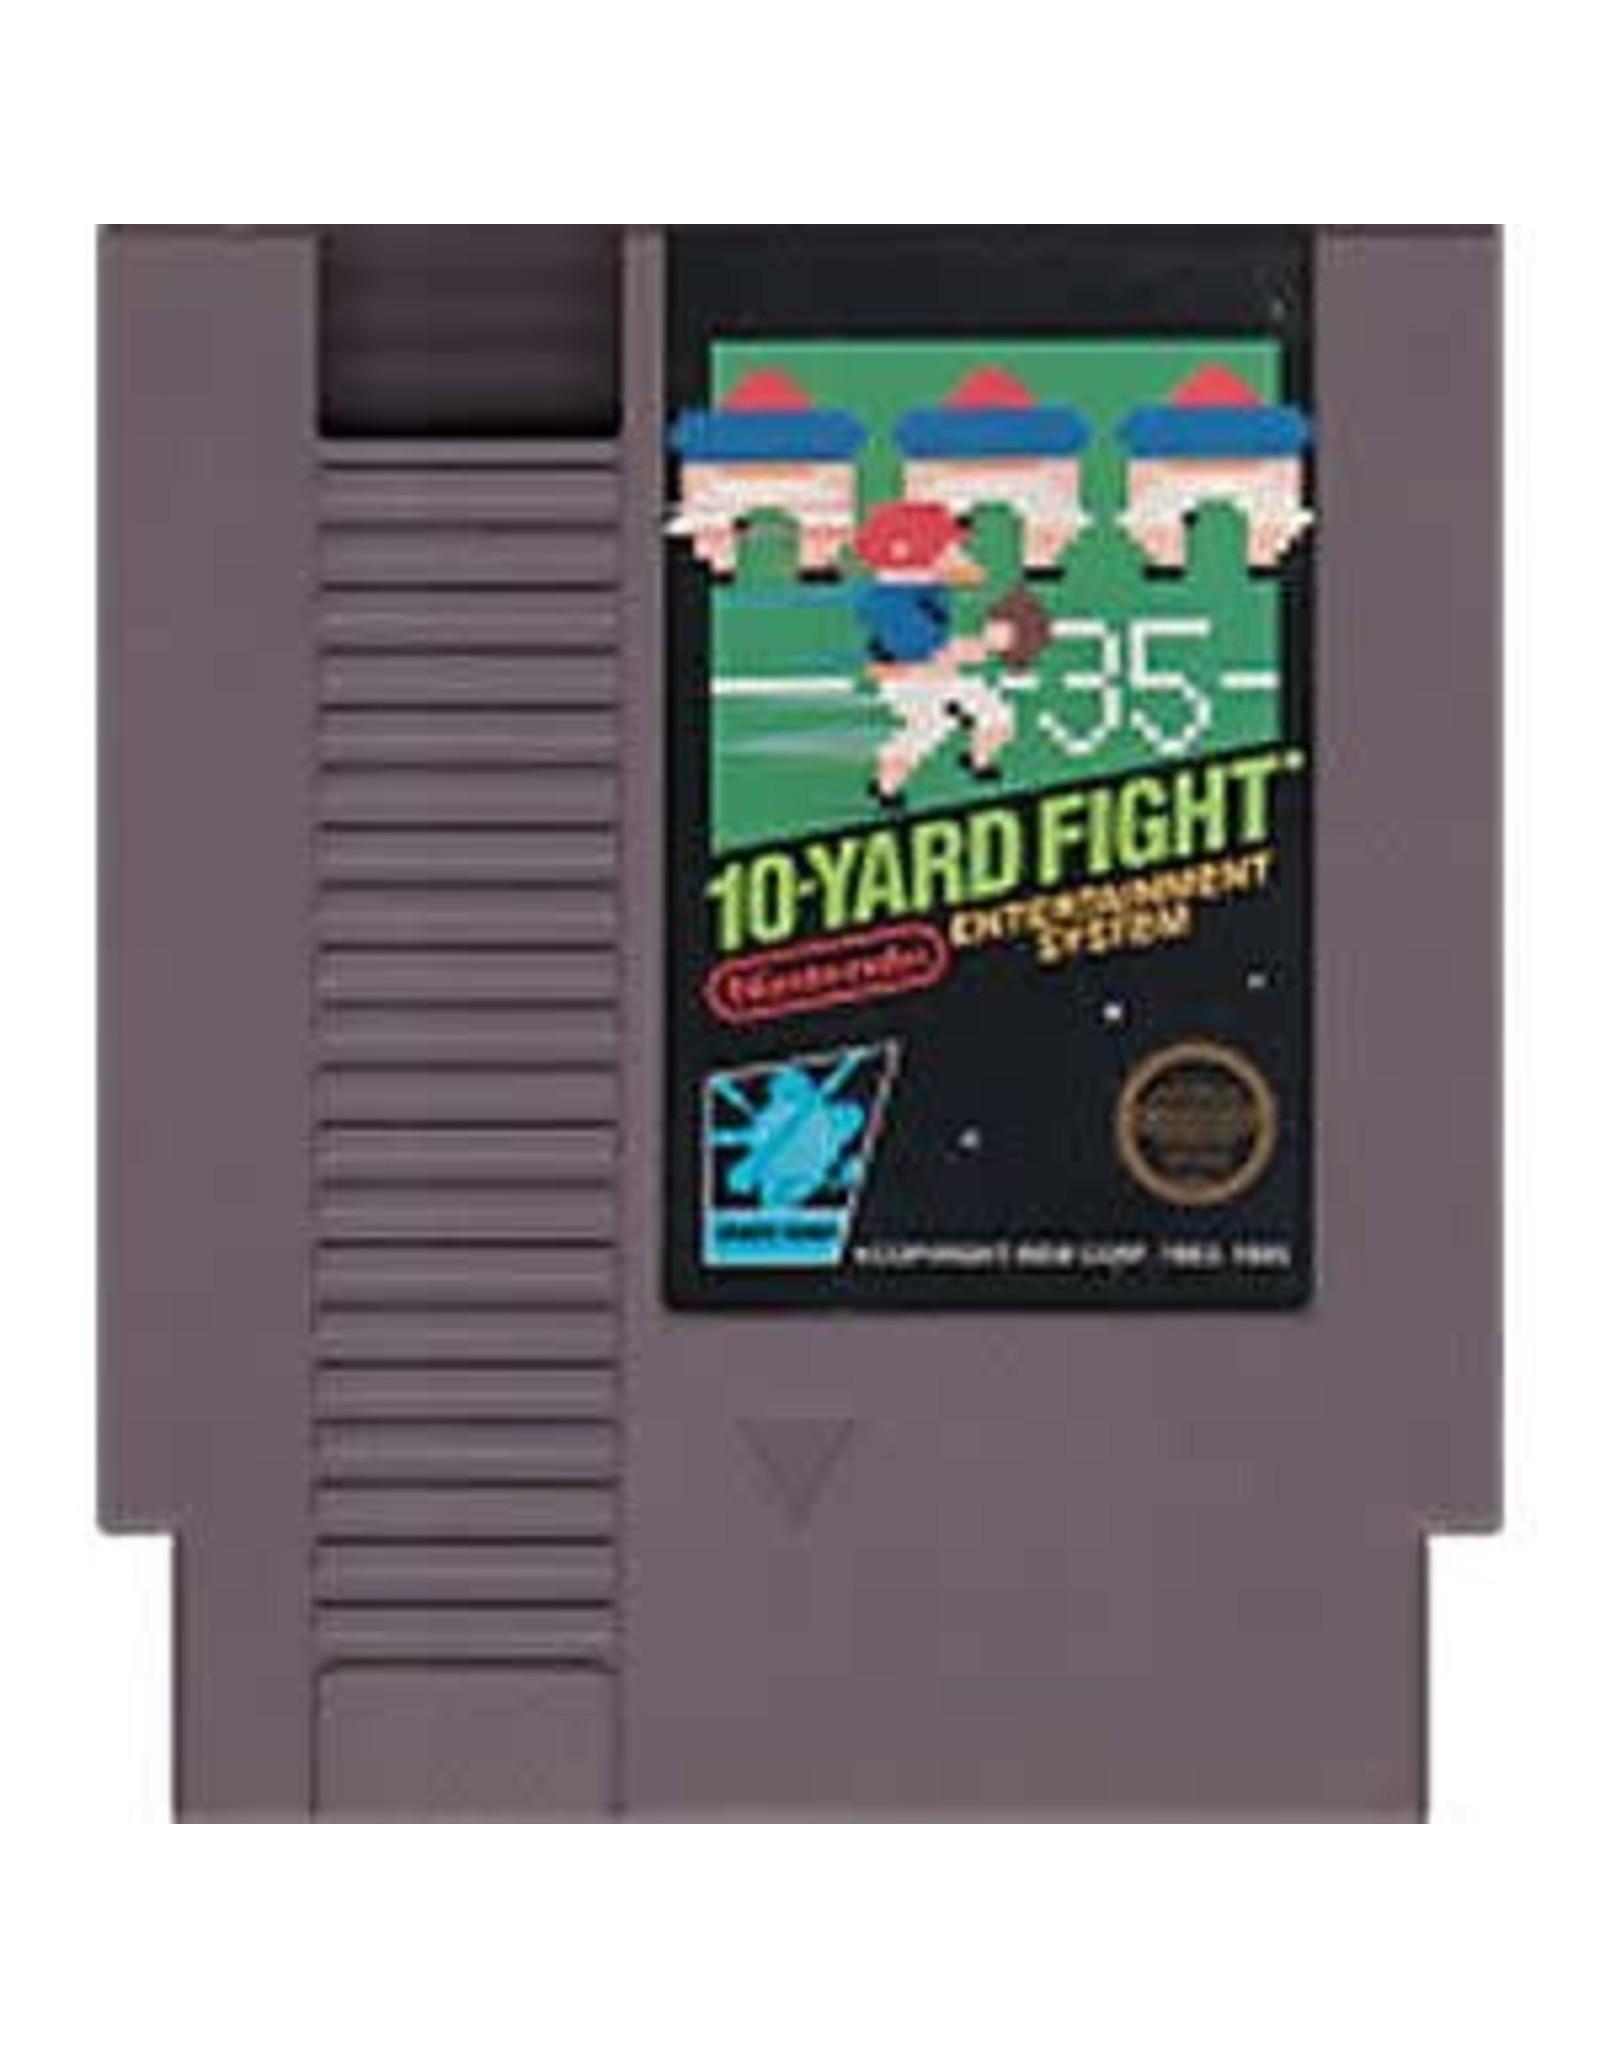 10-Yard Fight (NES)